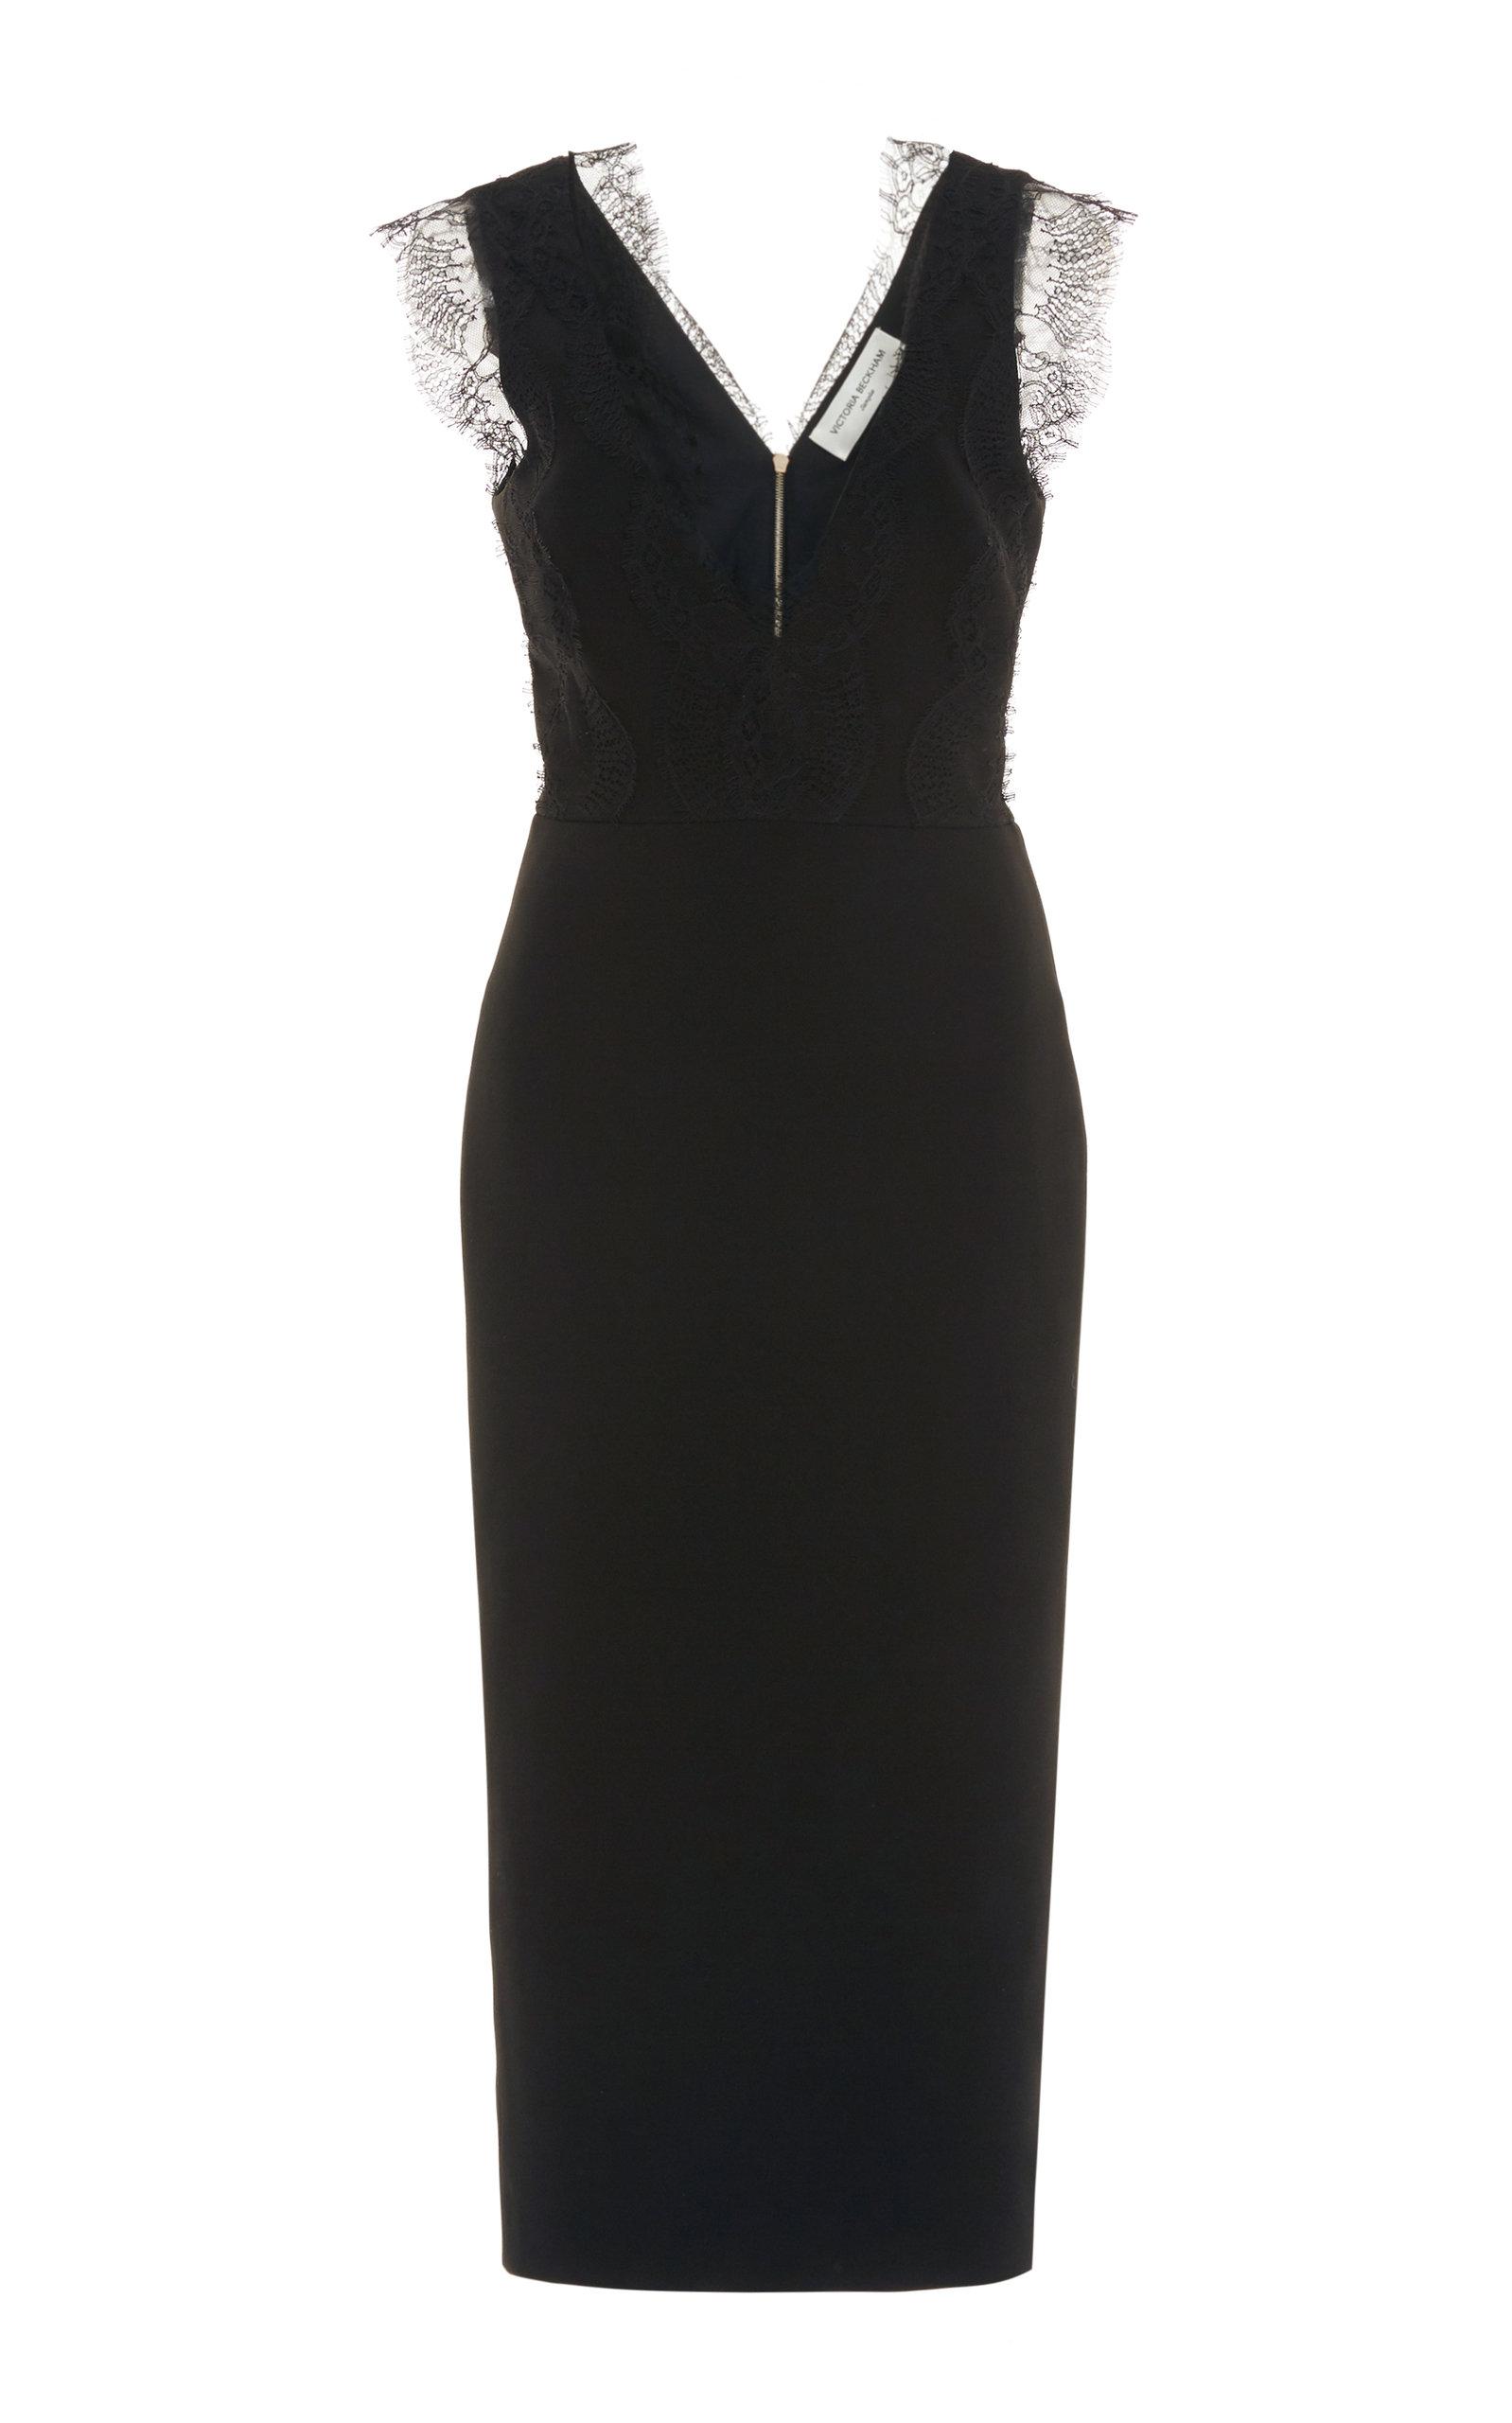 Victoria Beckham Bonded Crepe Lace Detail Midi Dress In Black